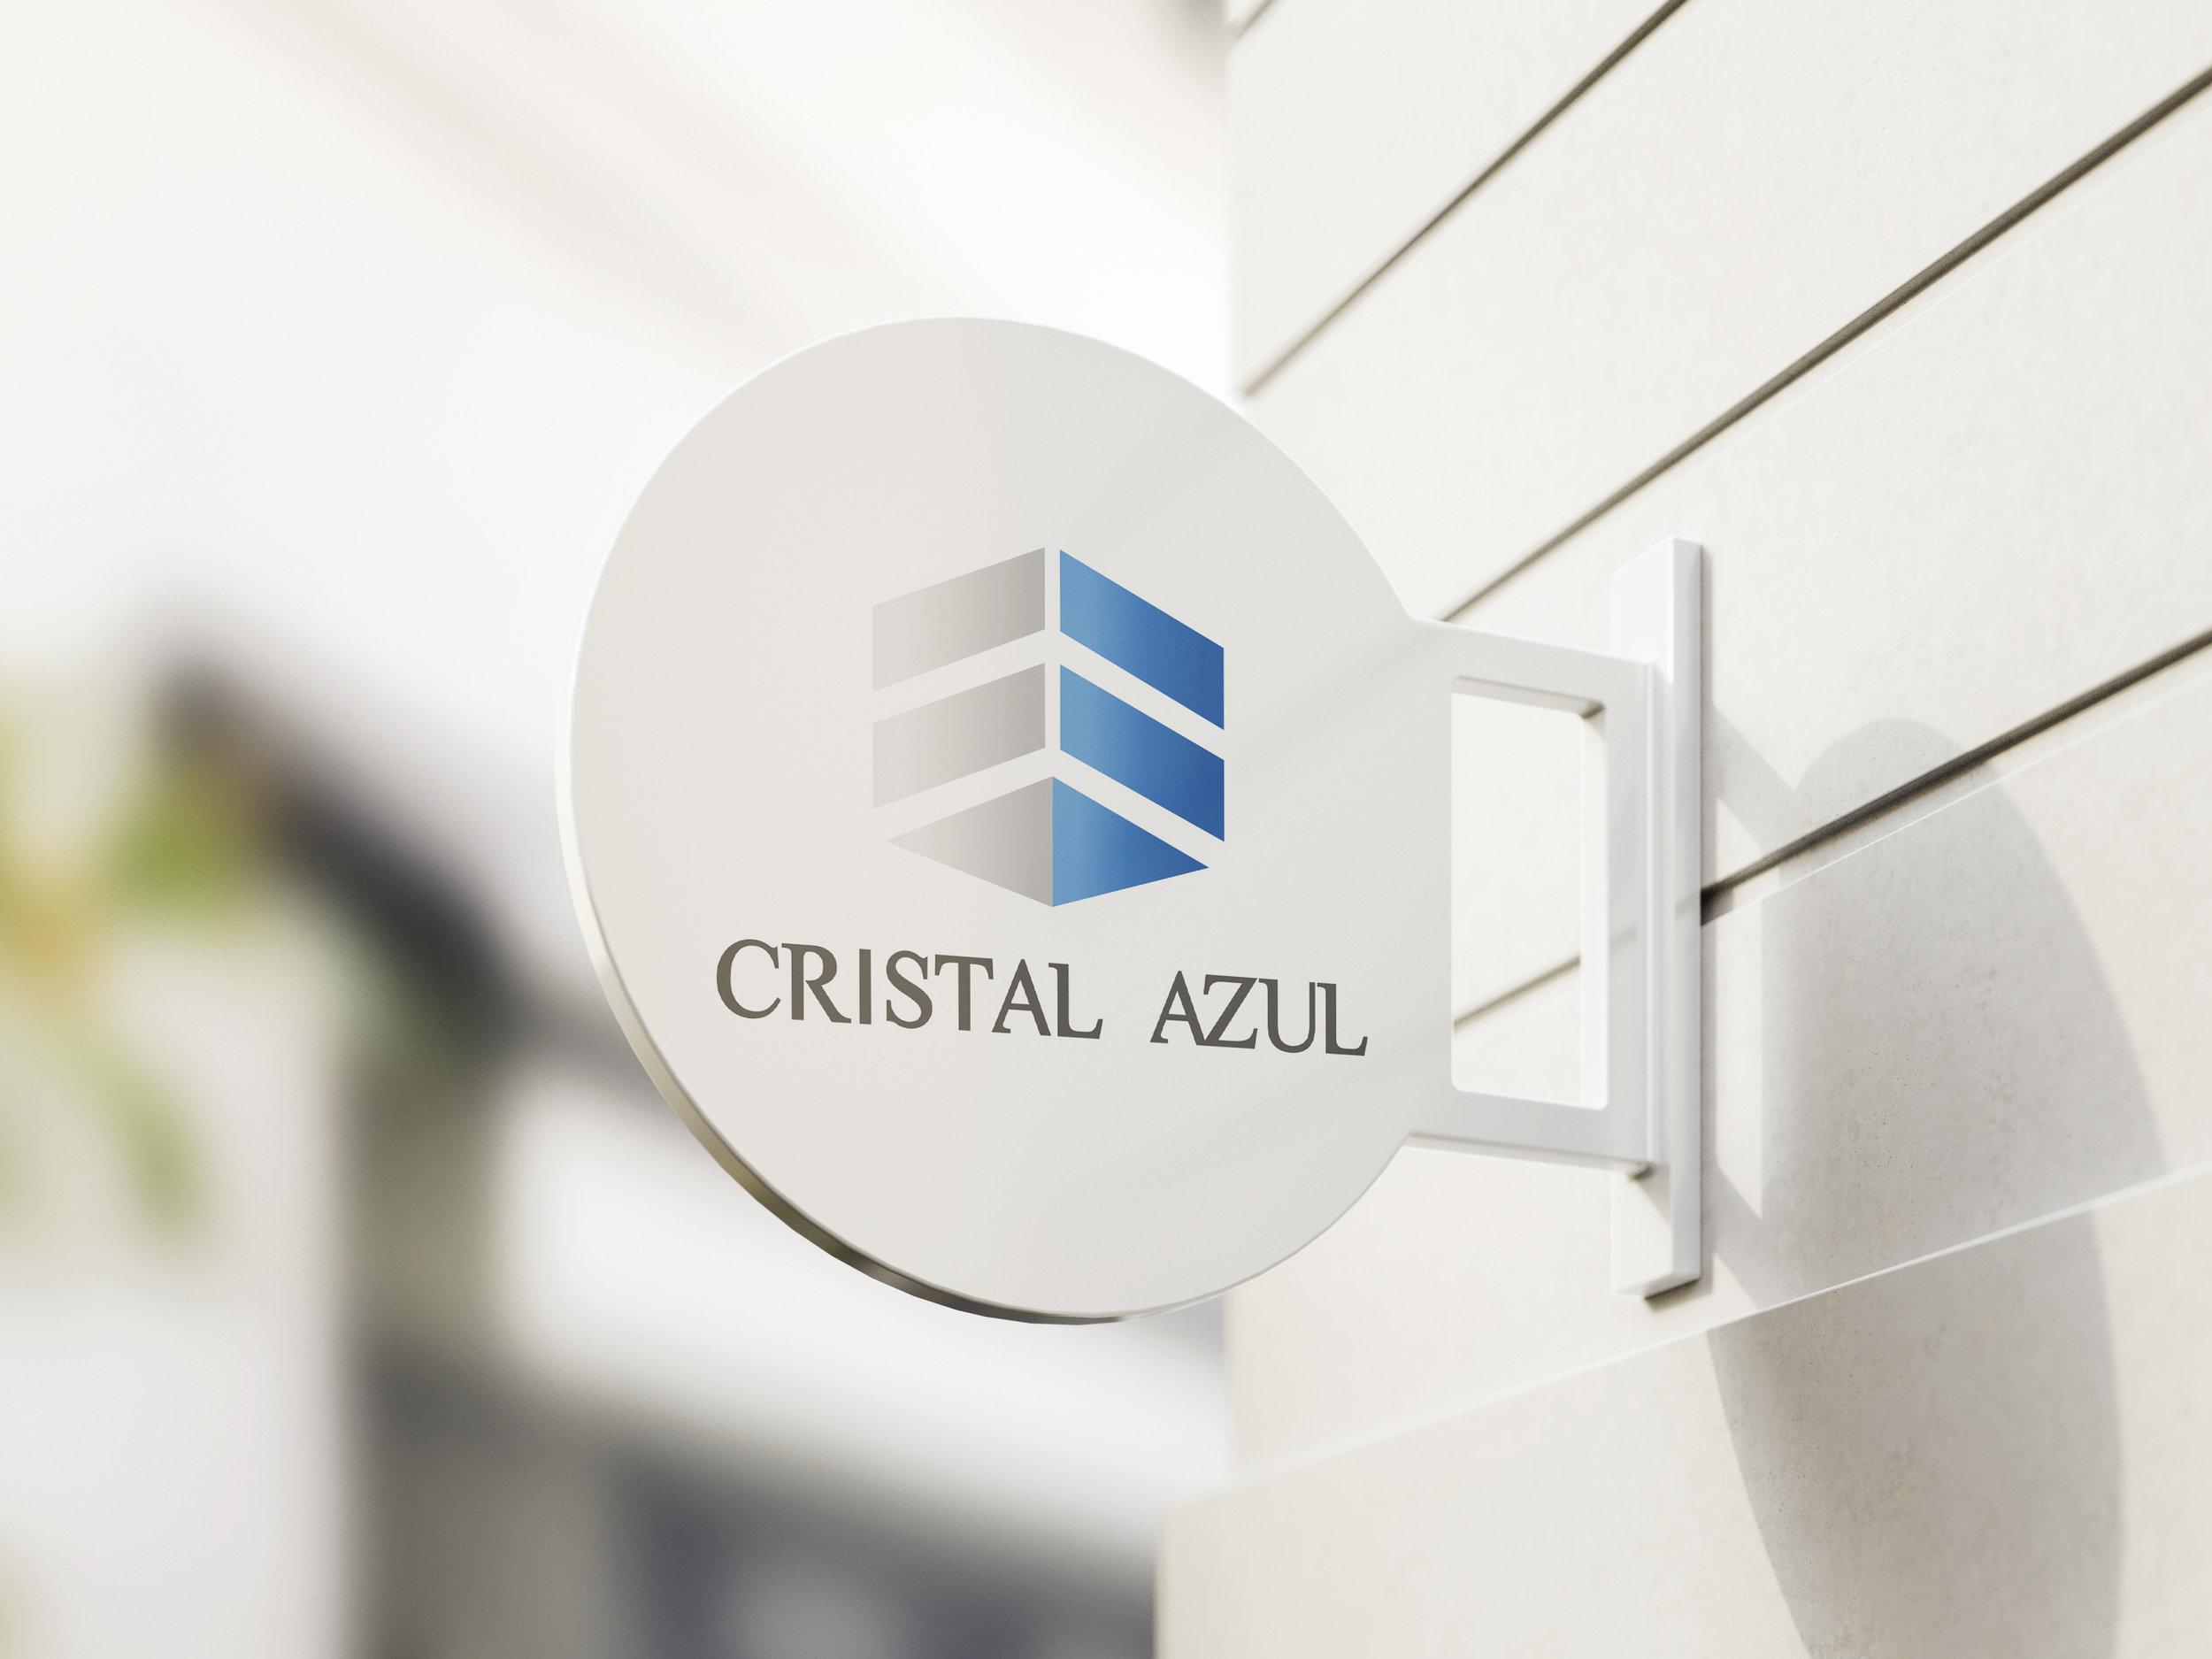 Cristal Azul.jpg